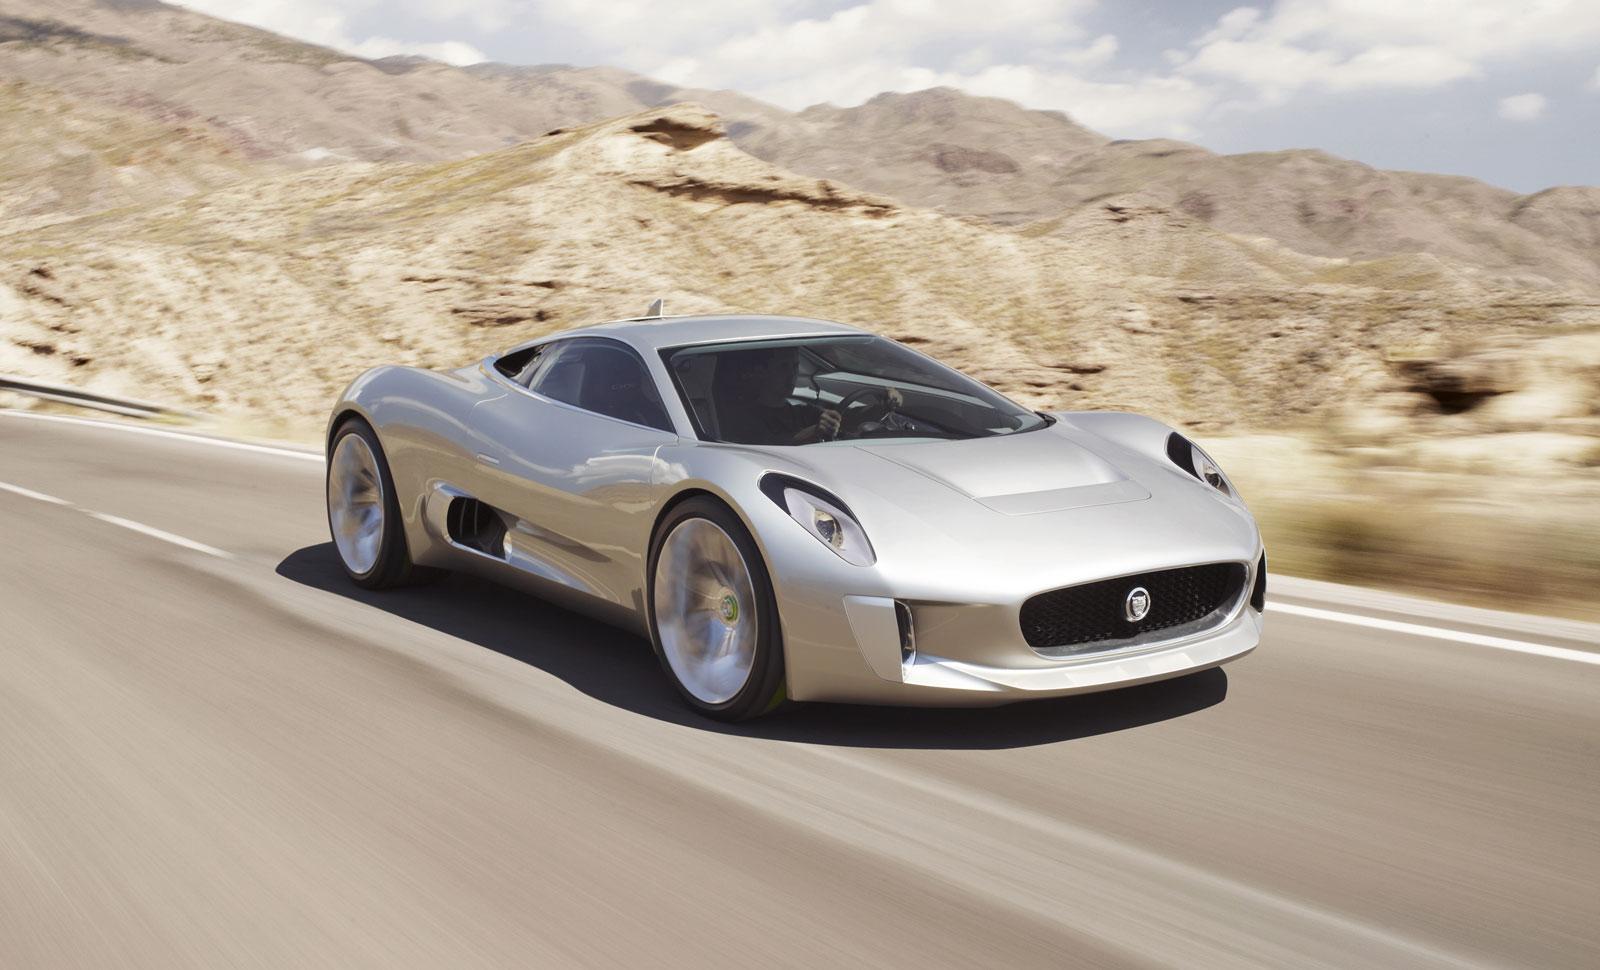 Information Auto Parts: Top 10 Progressive Sports Cars of the Future